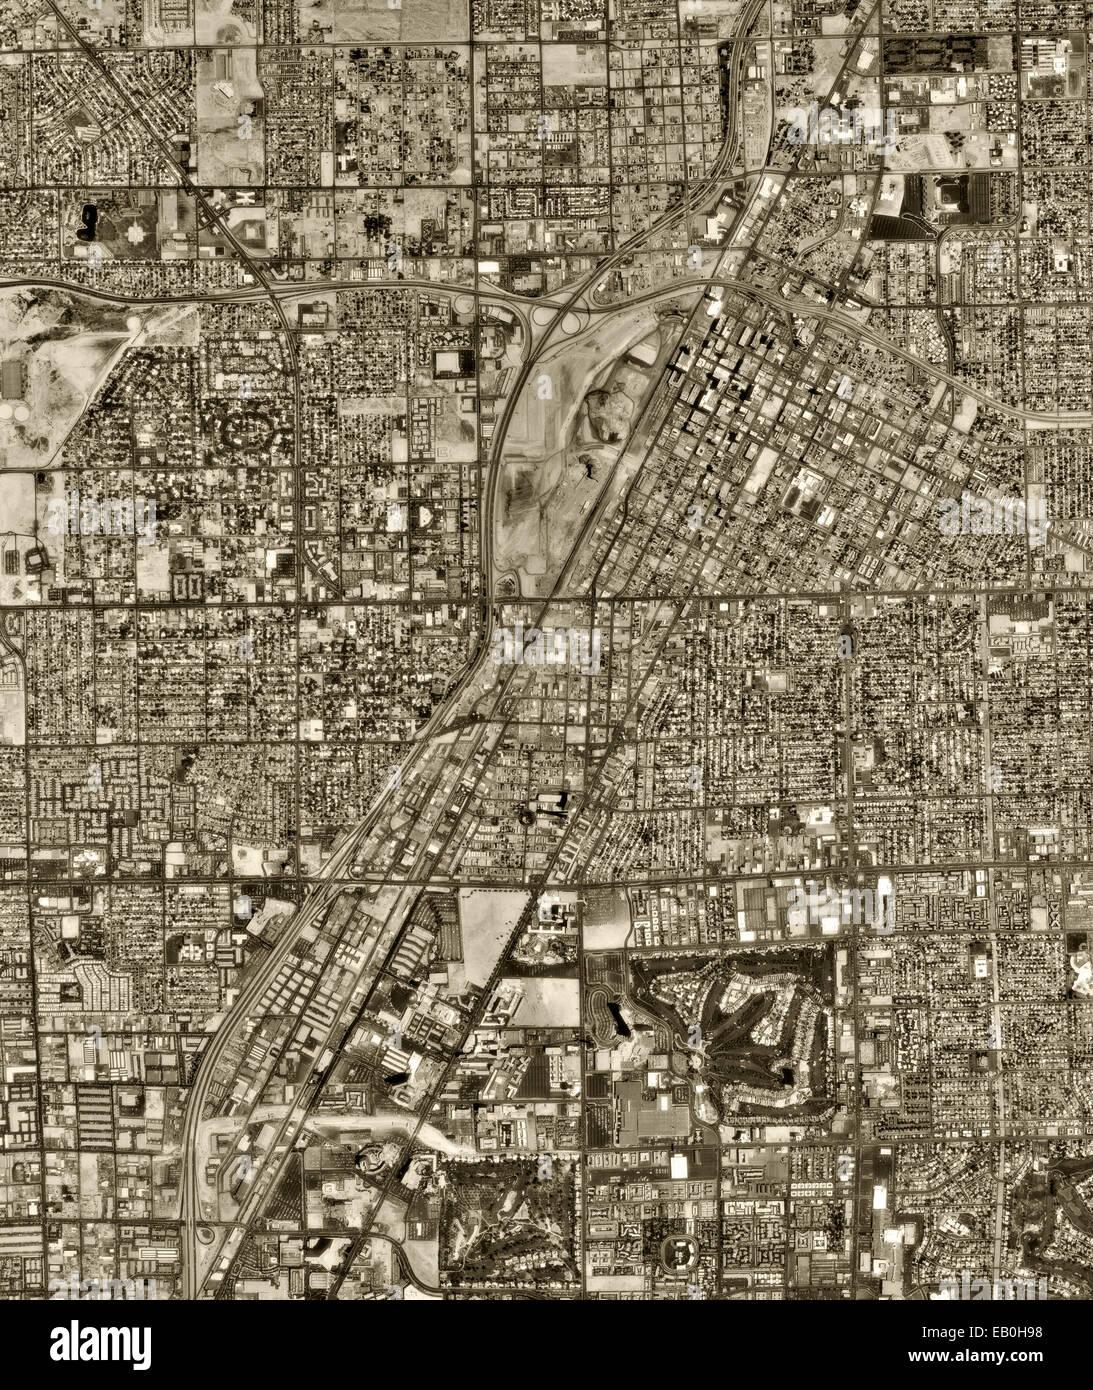 historical aerial photograph Las Vegas, Nevada, 1994 - Stock Image